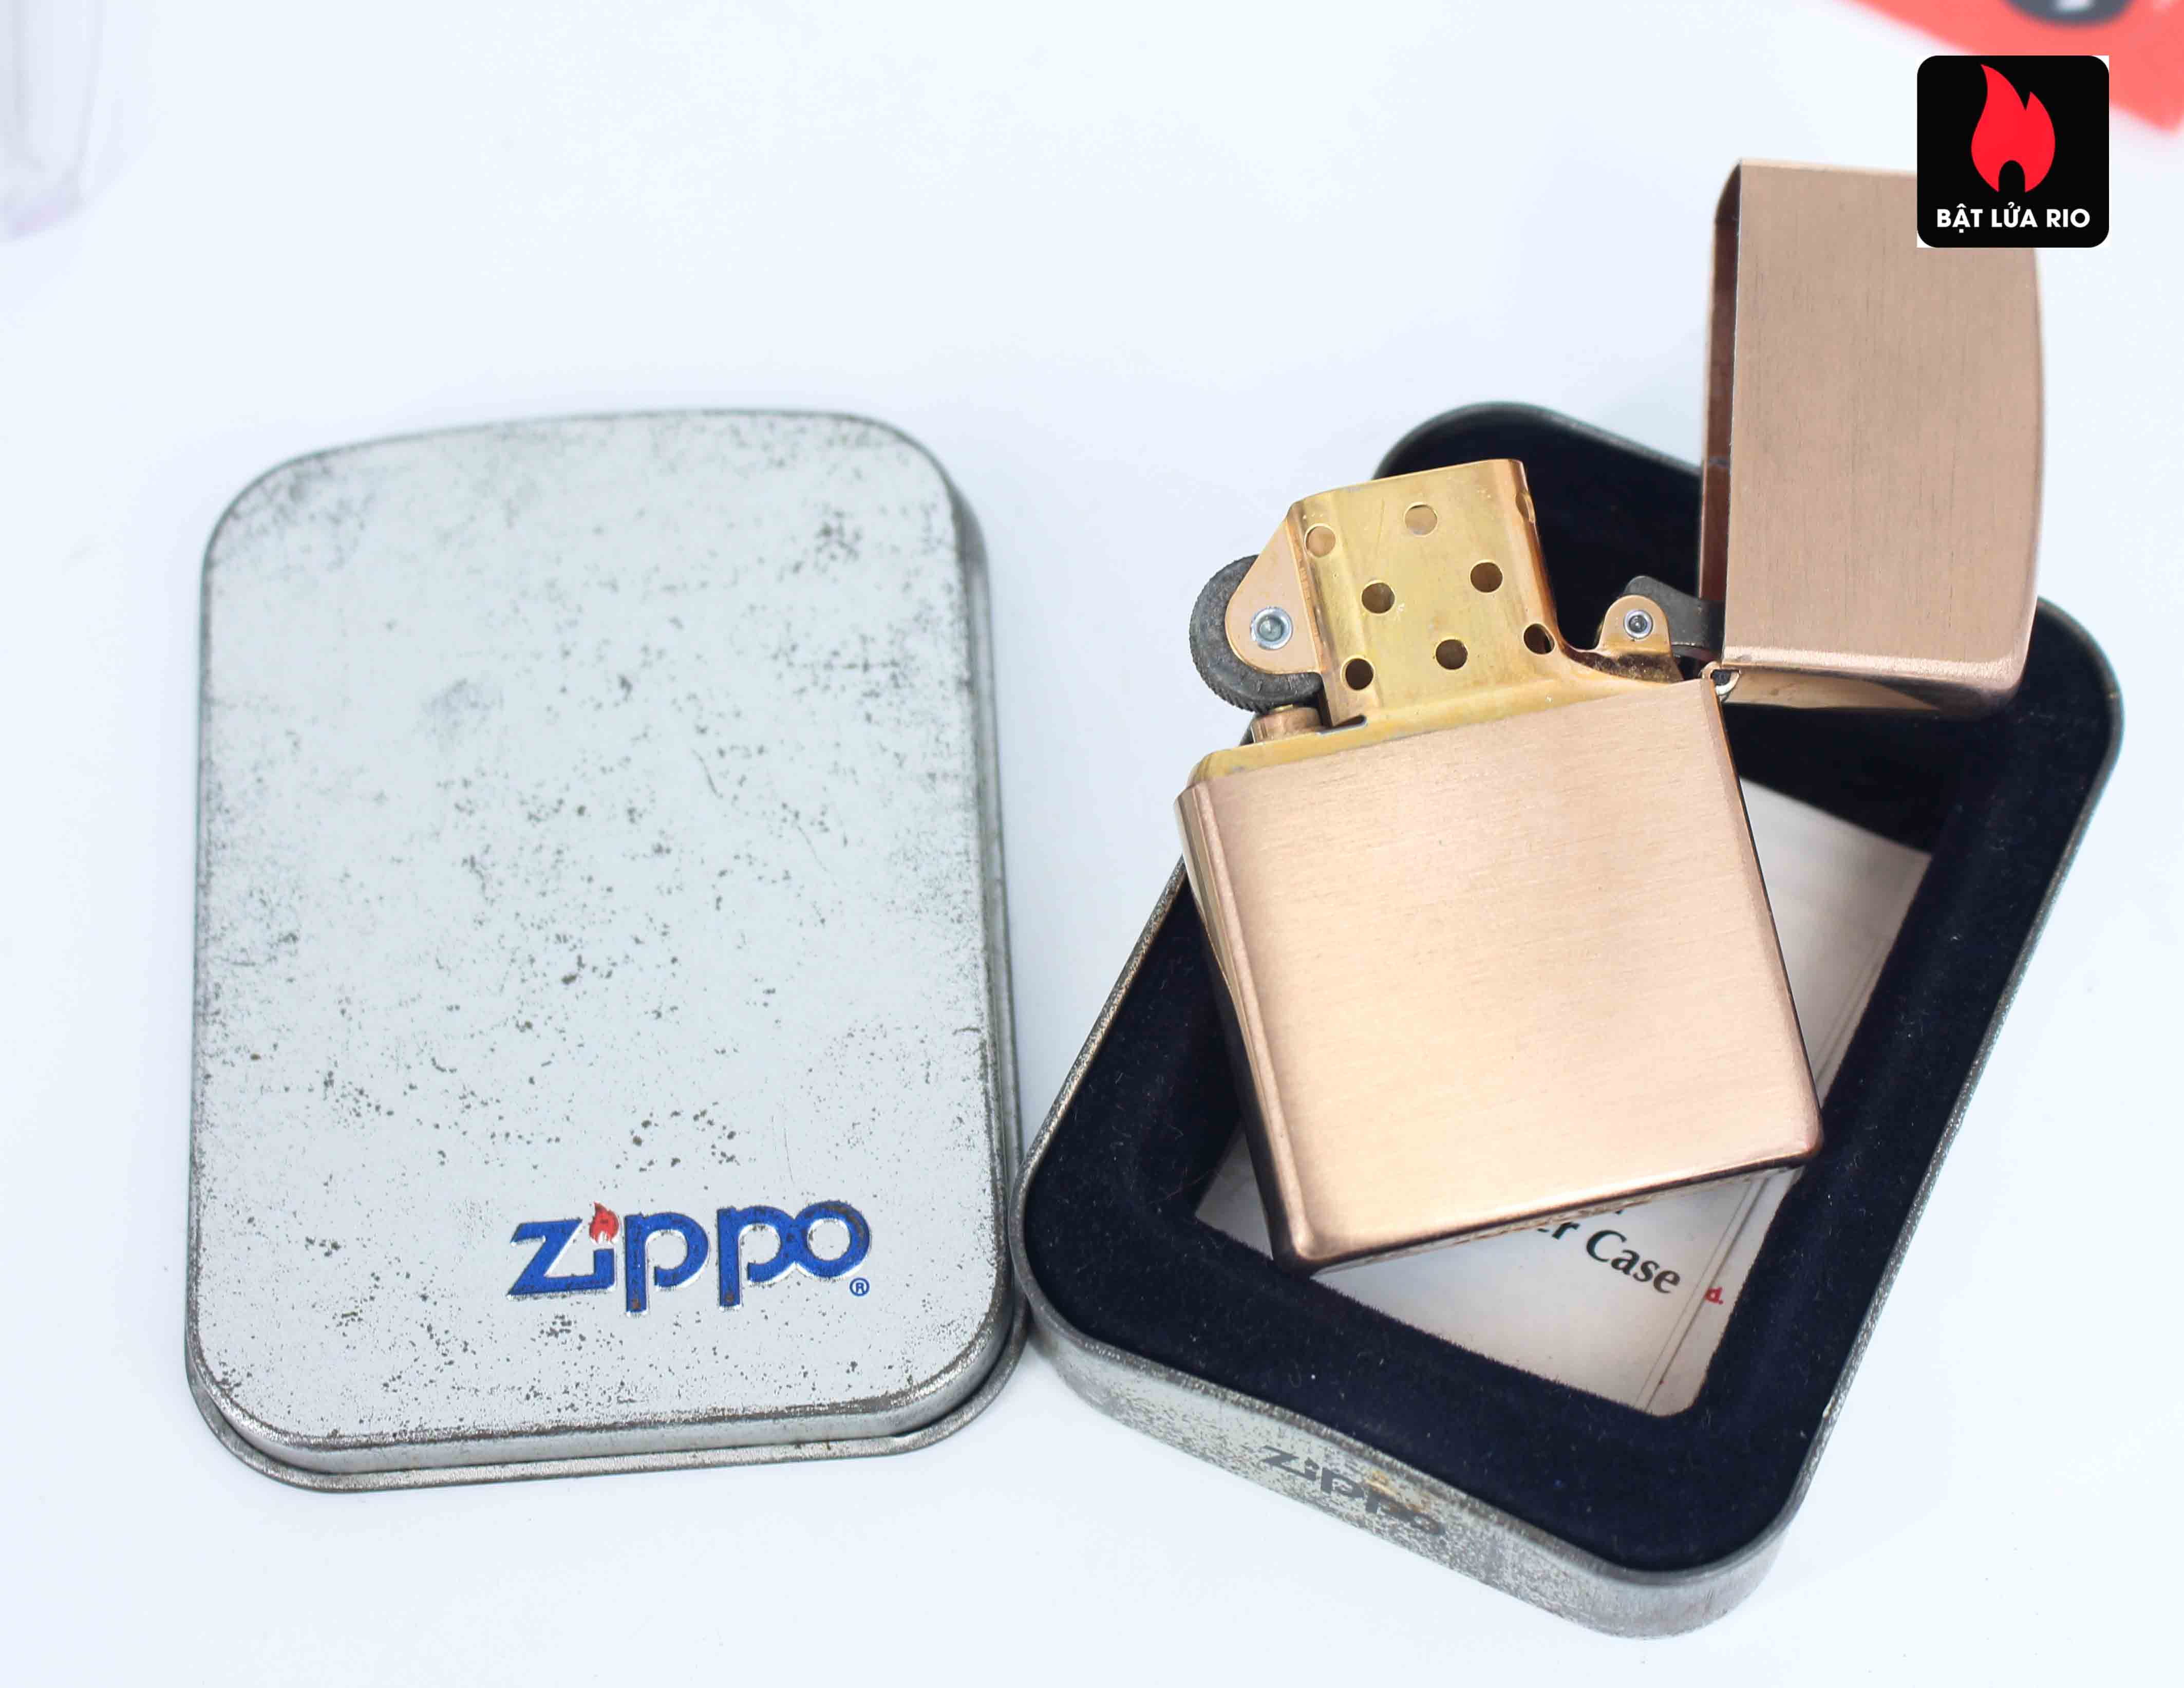 Zippo 2003 - Solid Copper - Phantasma Hand Finished 4